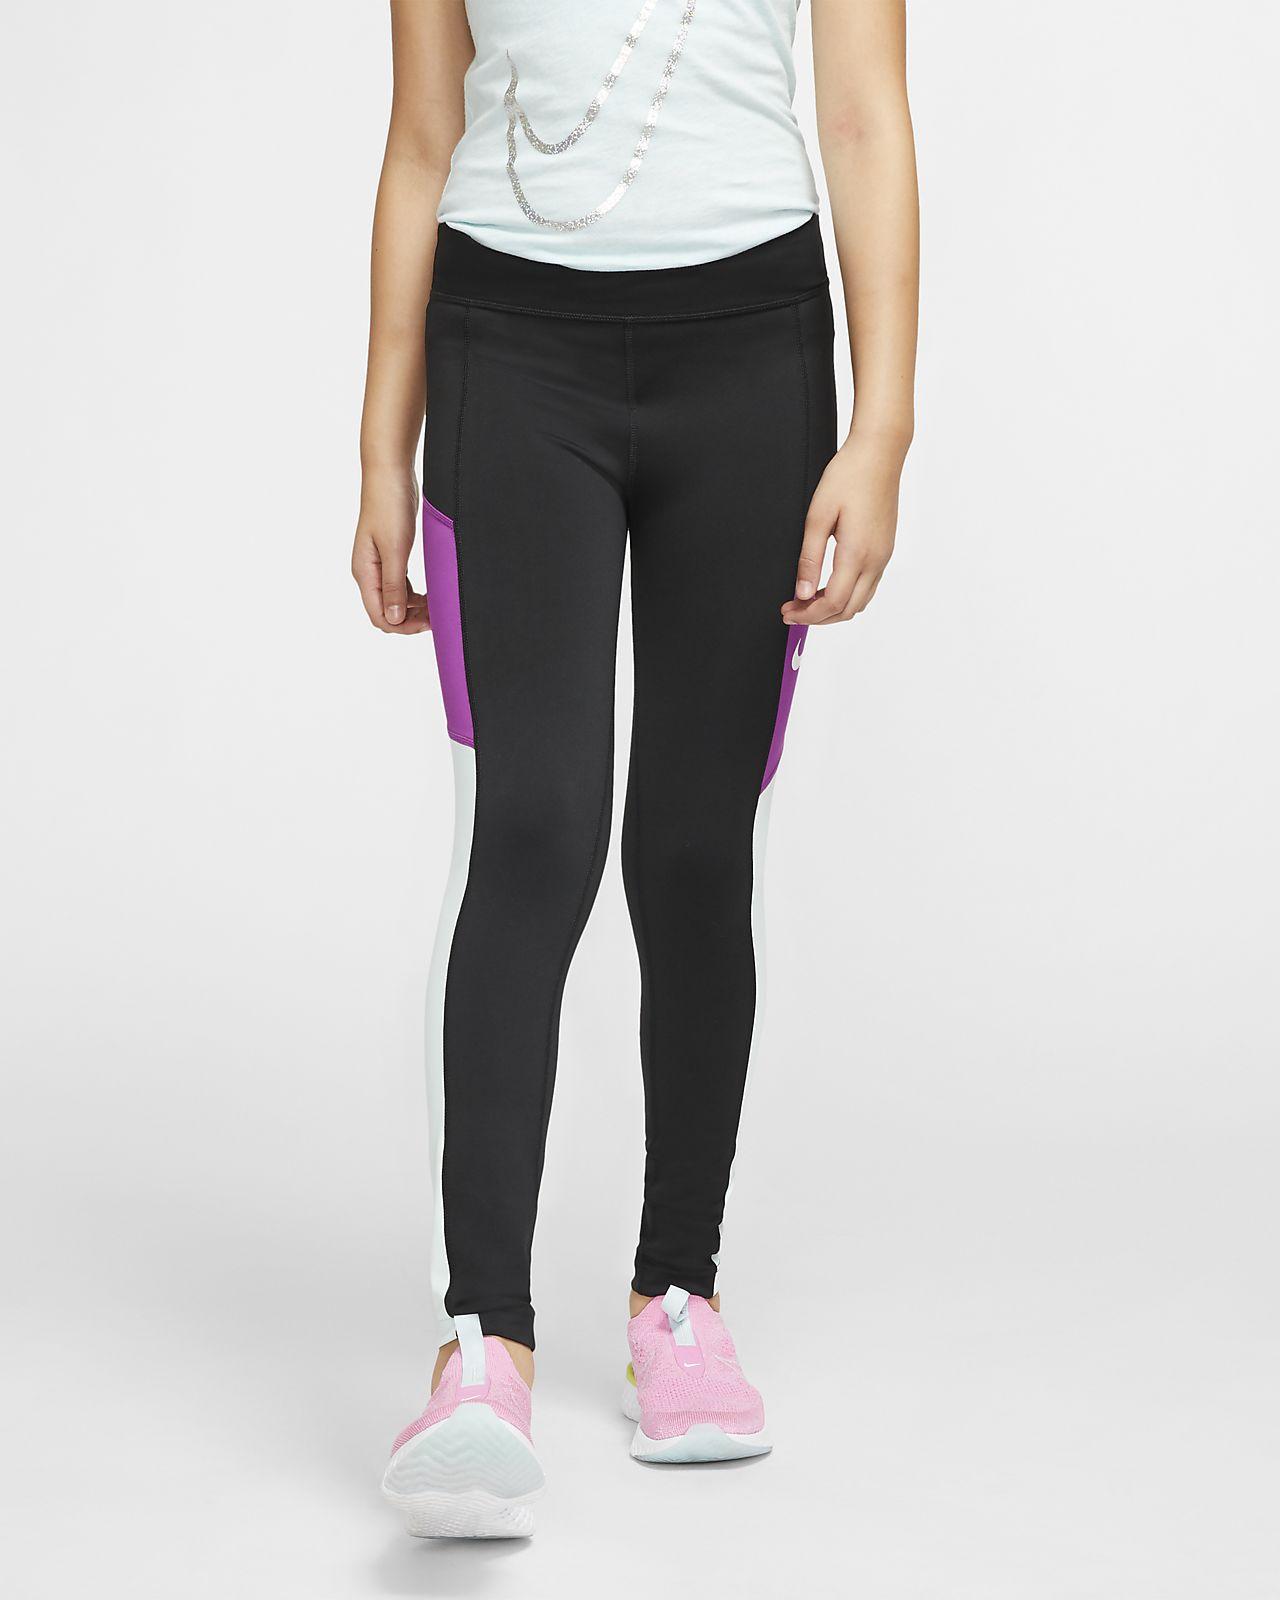 Nike Trophy Big Kids' (Girls') Training Tights